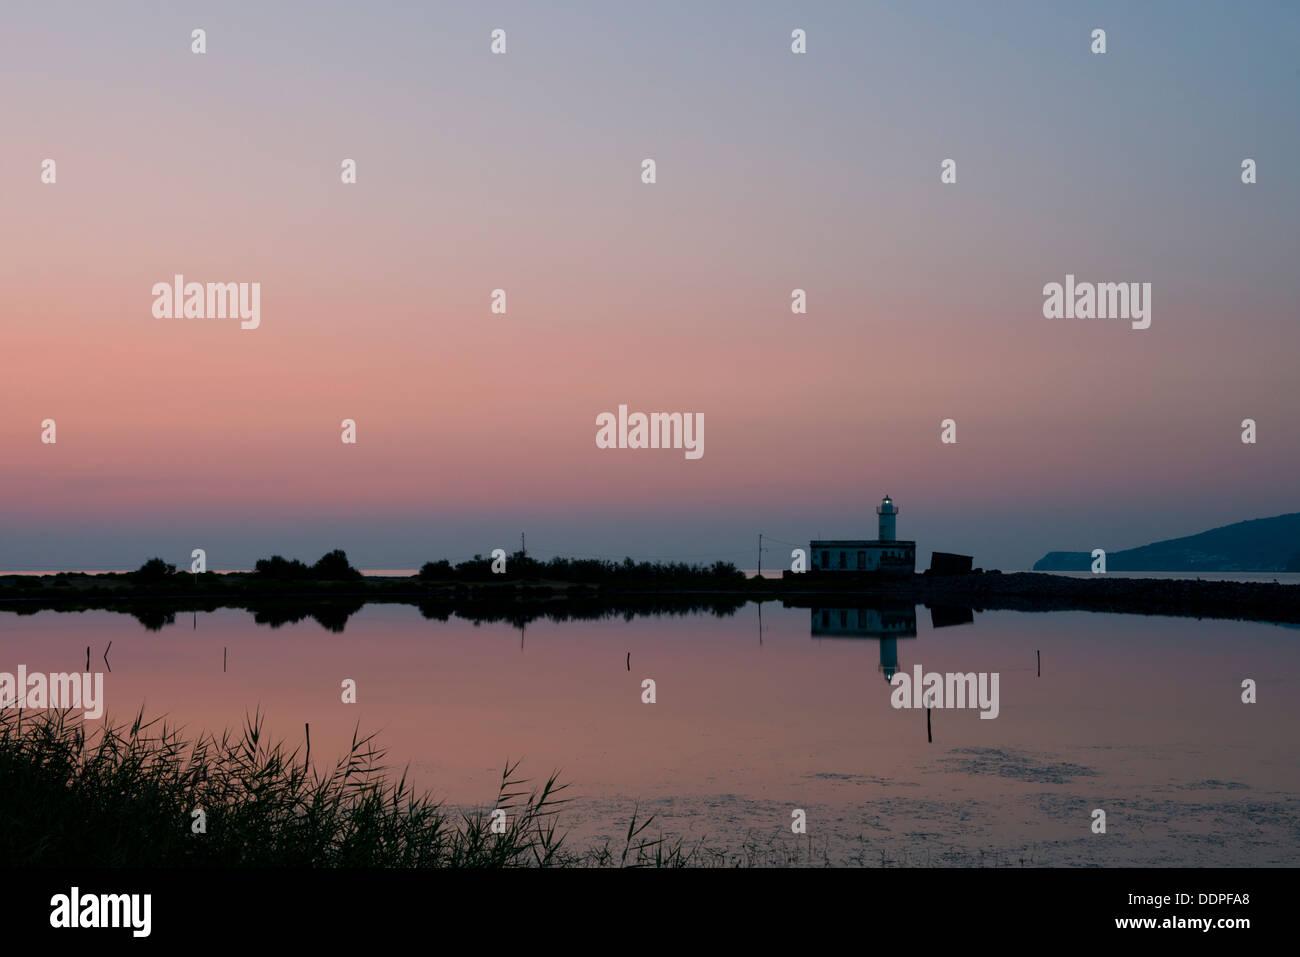 The Punta Lingua Lighthouse at sunrise on the island of Salina in the Aeolian Islands, Sicily, Italy - Stock Image